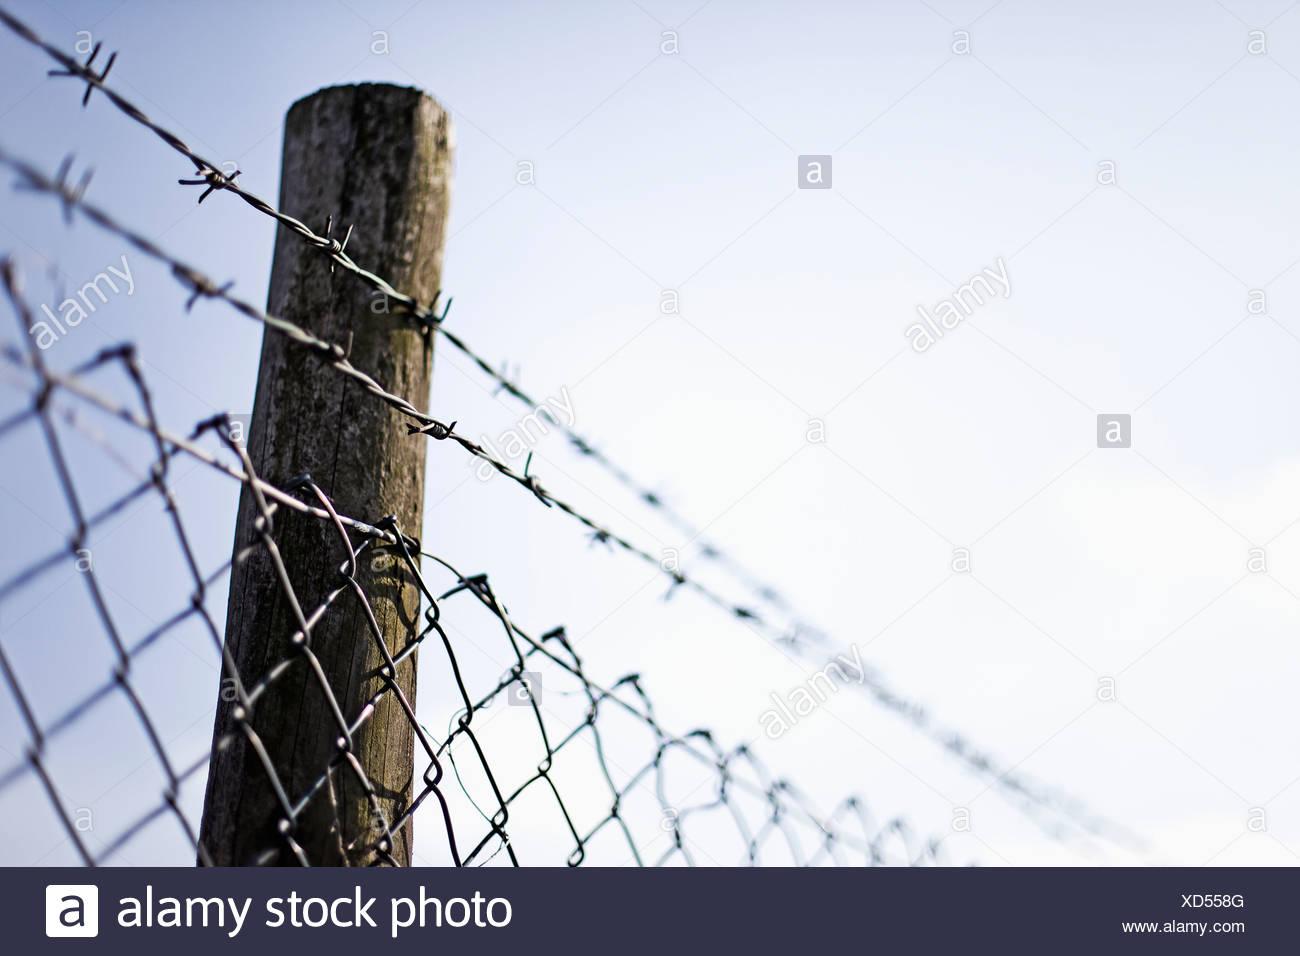 Germany, North Rhine Westphalia, Neuss, Wire mesh fence with pole against sky - Stock Image